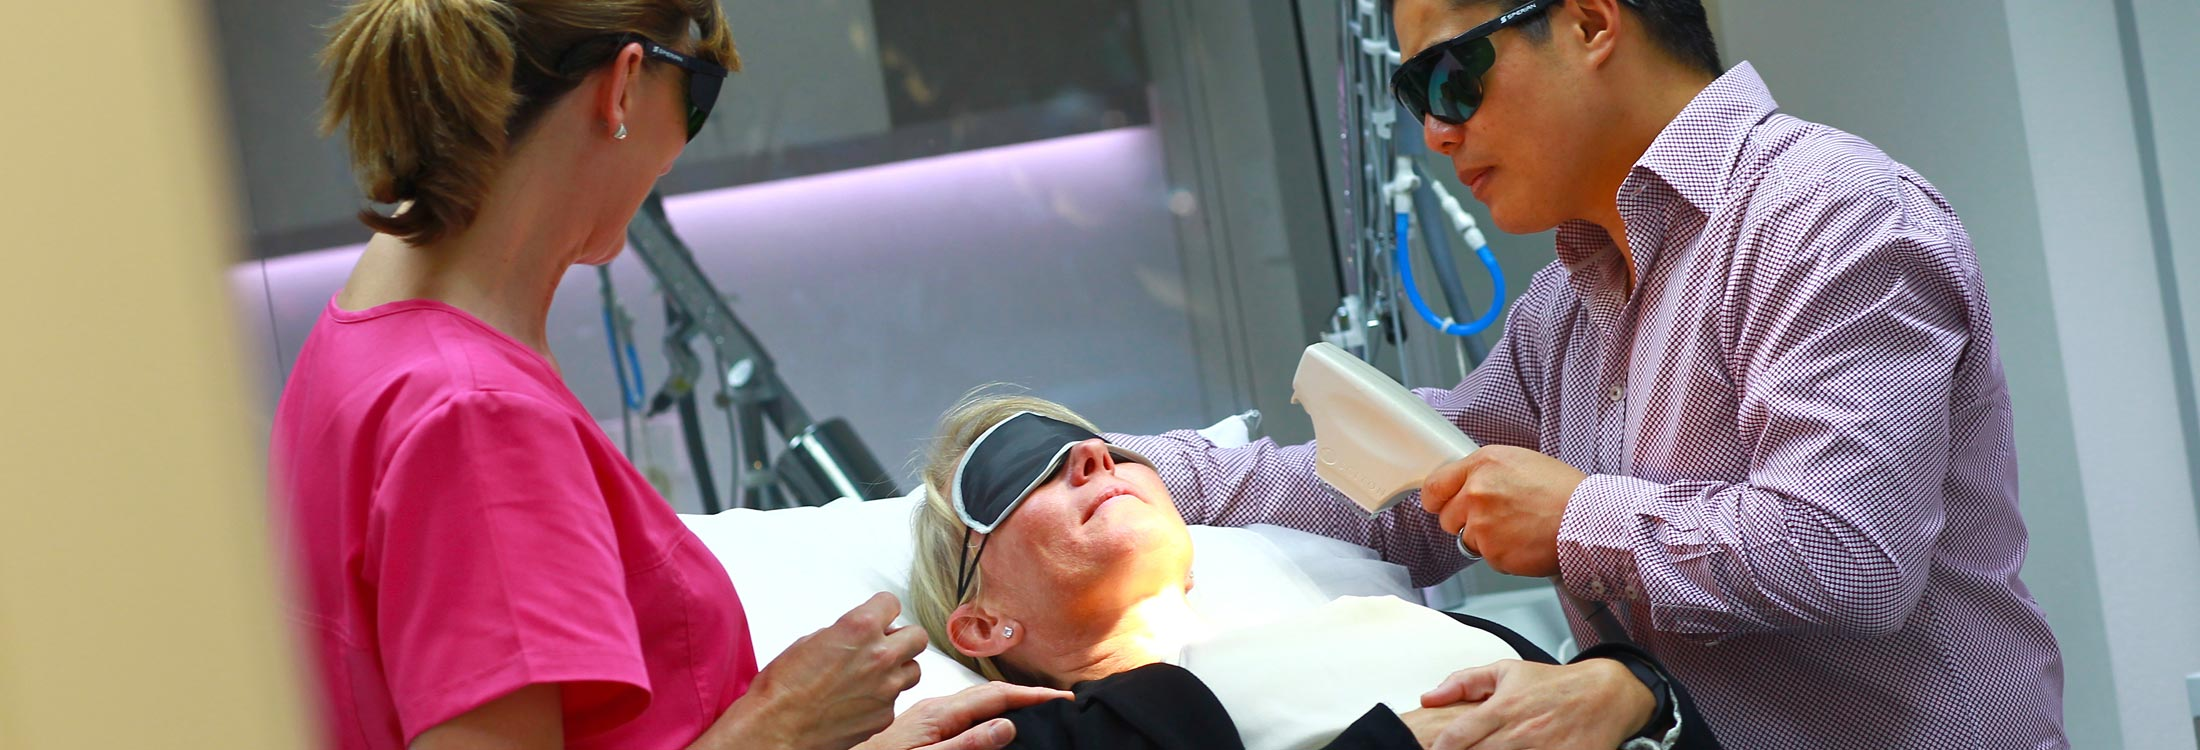 Radien Dermatology Laser Therapies